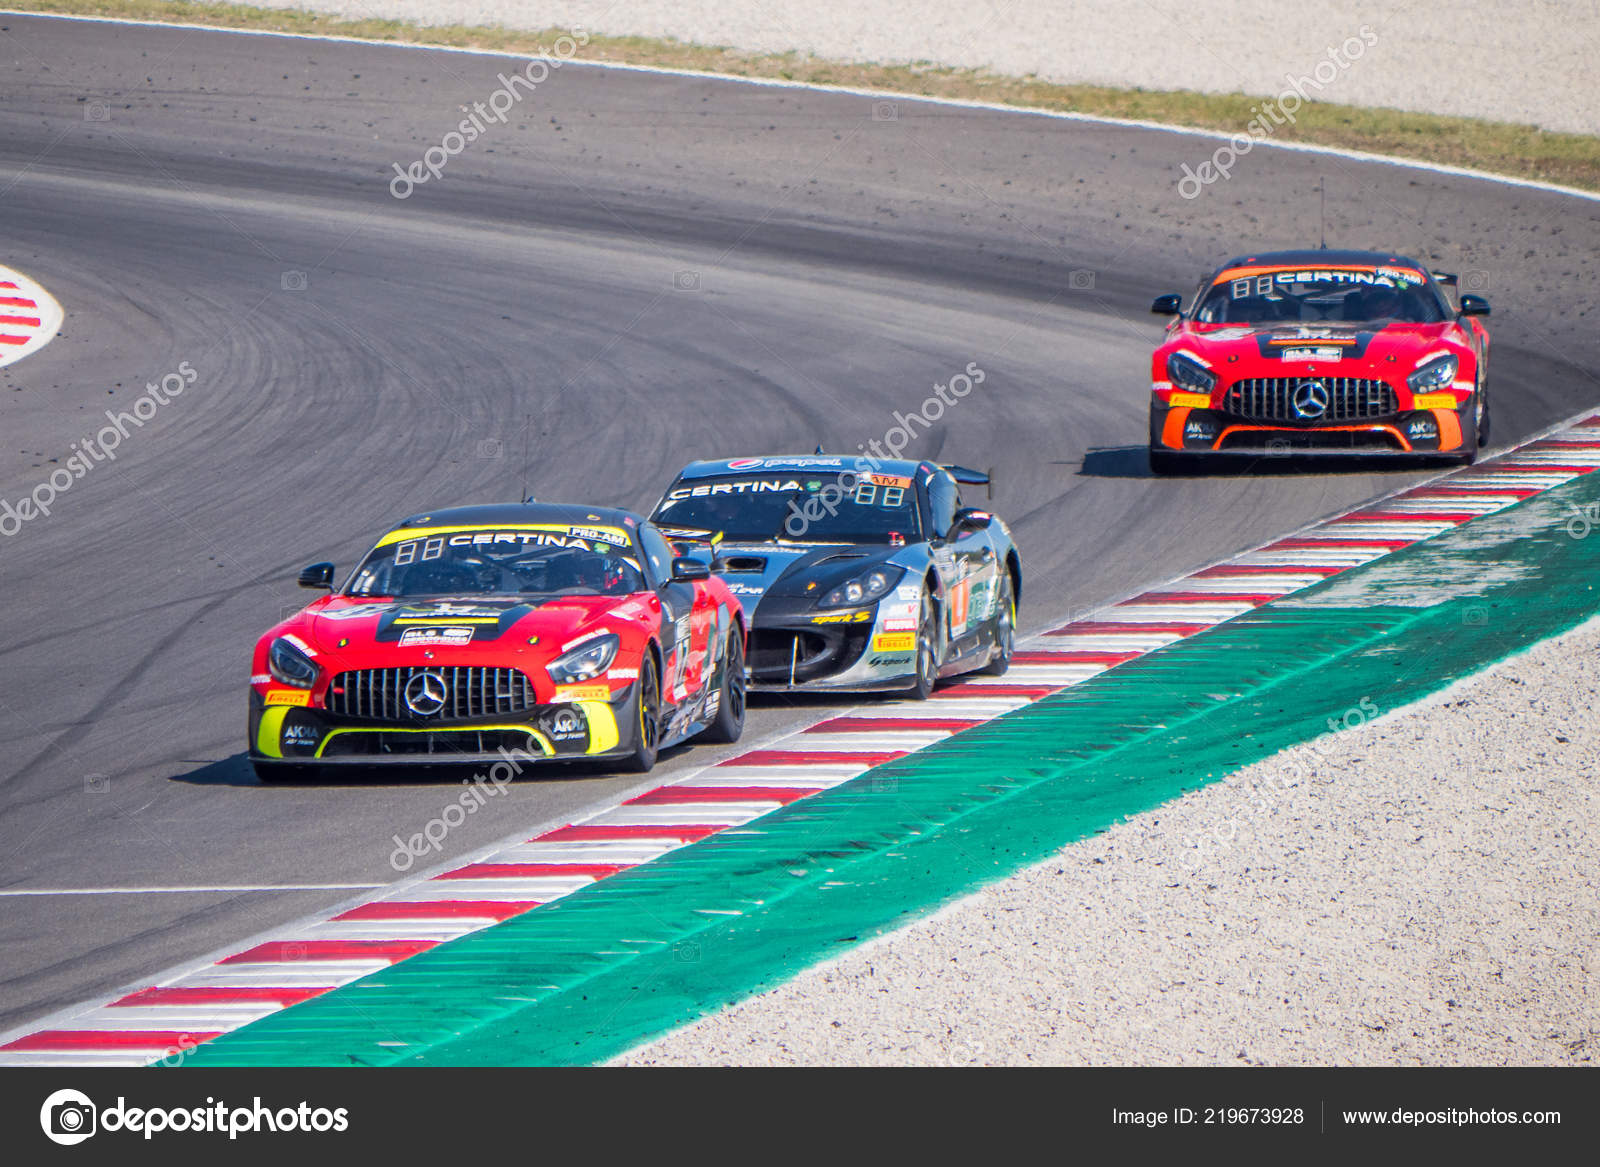 Circuito Montmelo : Montmelo barcelona españa carreras autos circuito u2014 foto editorial